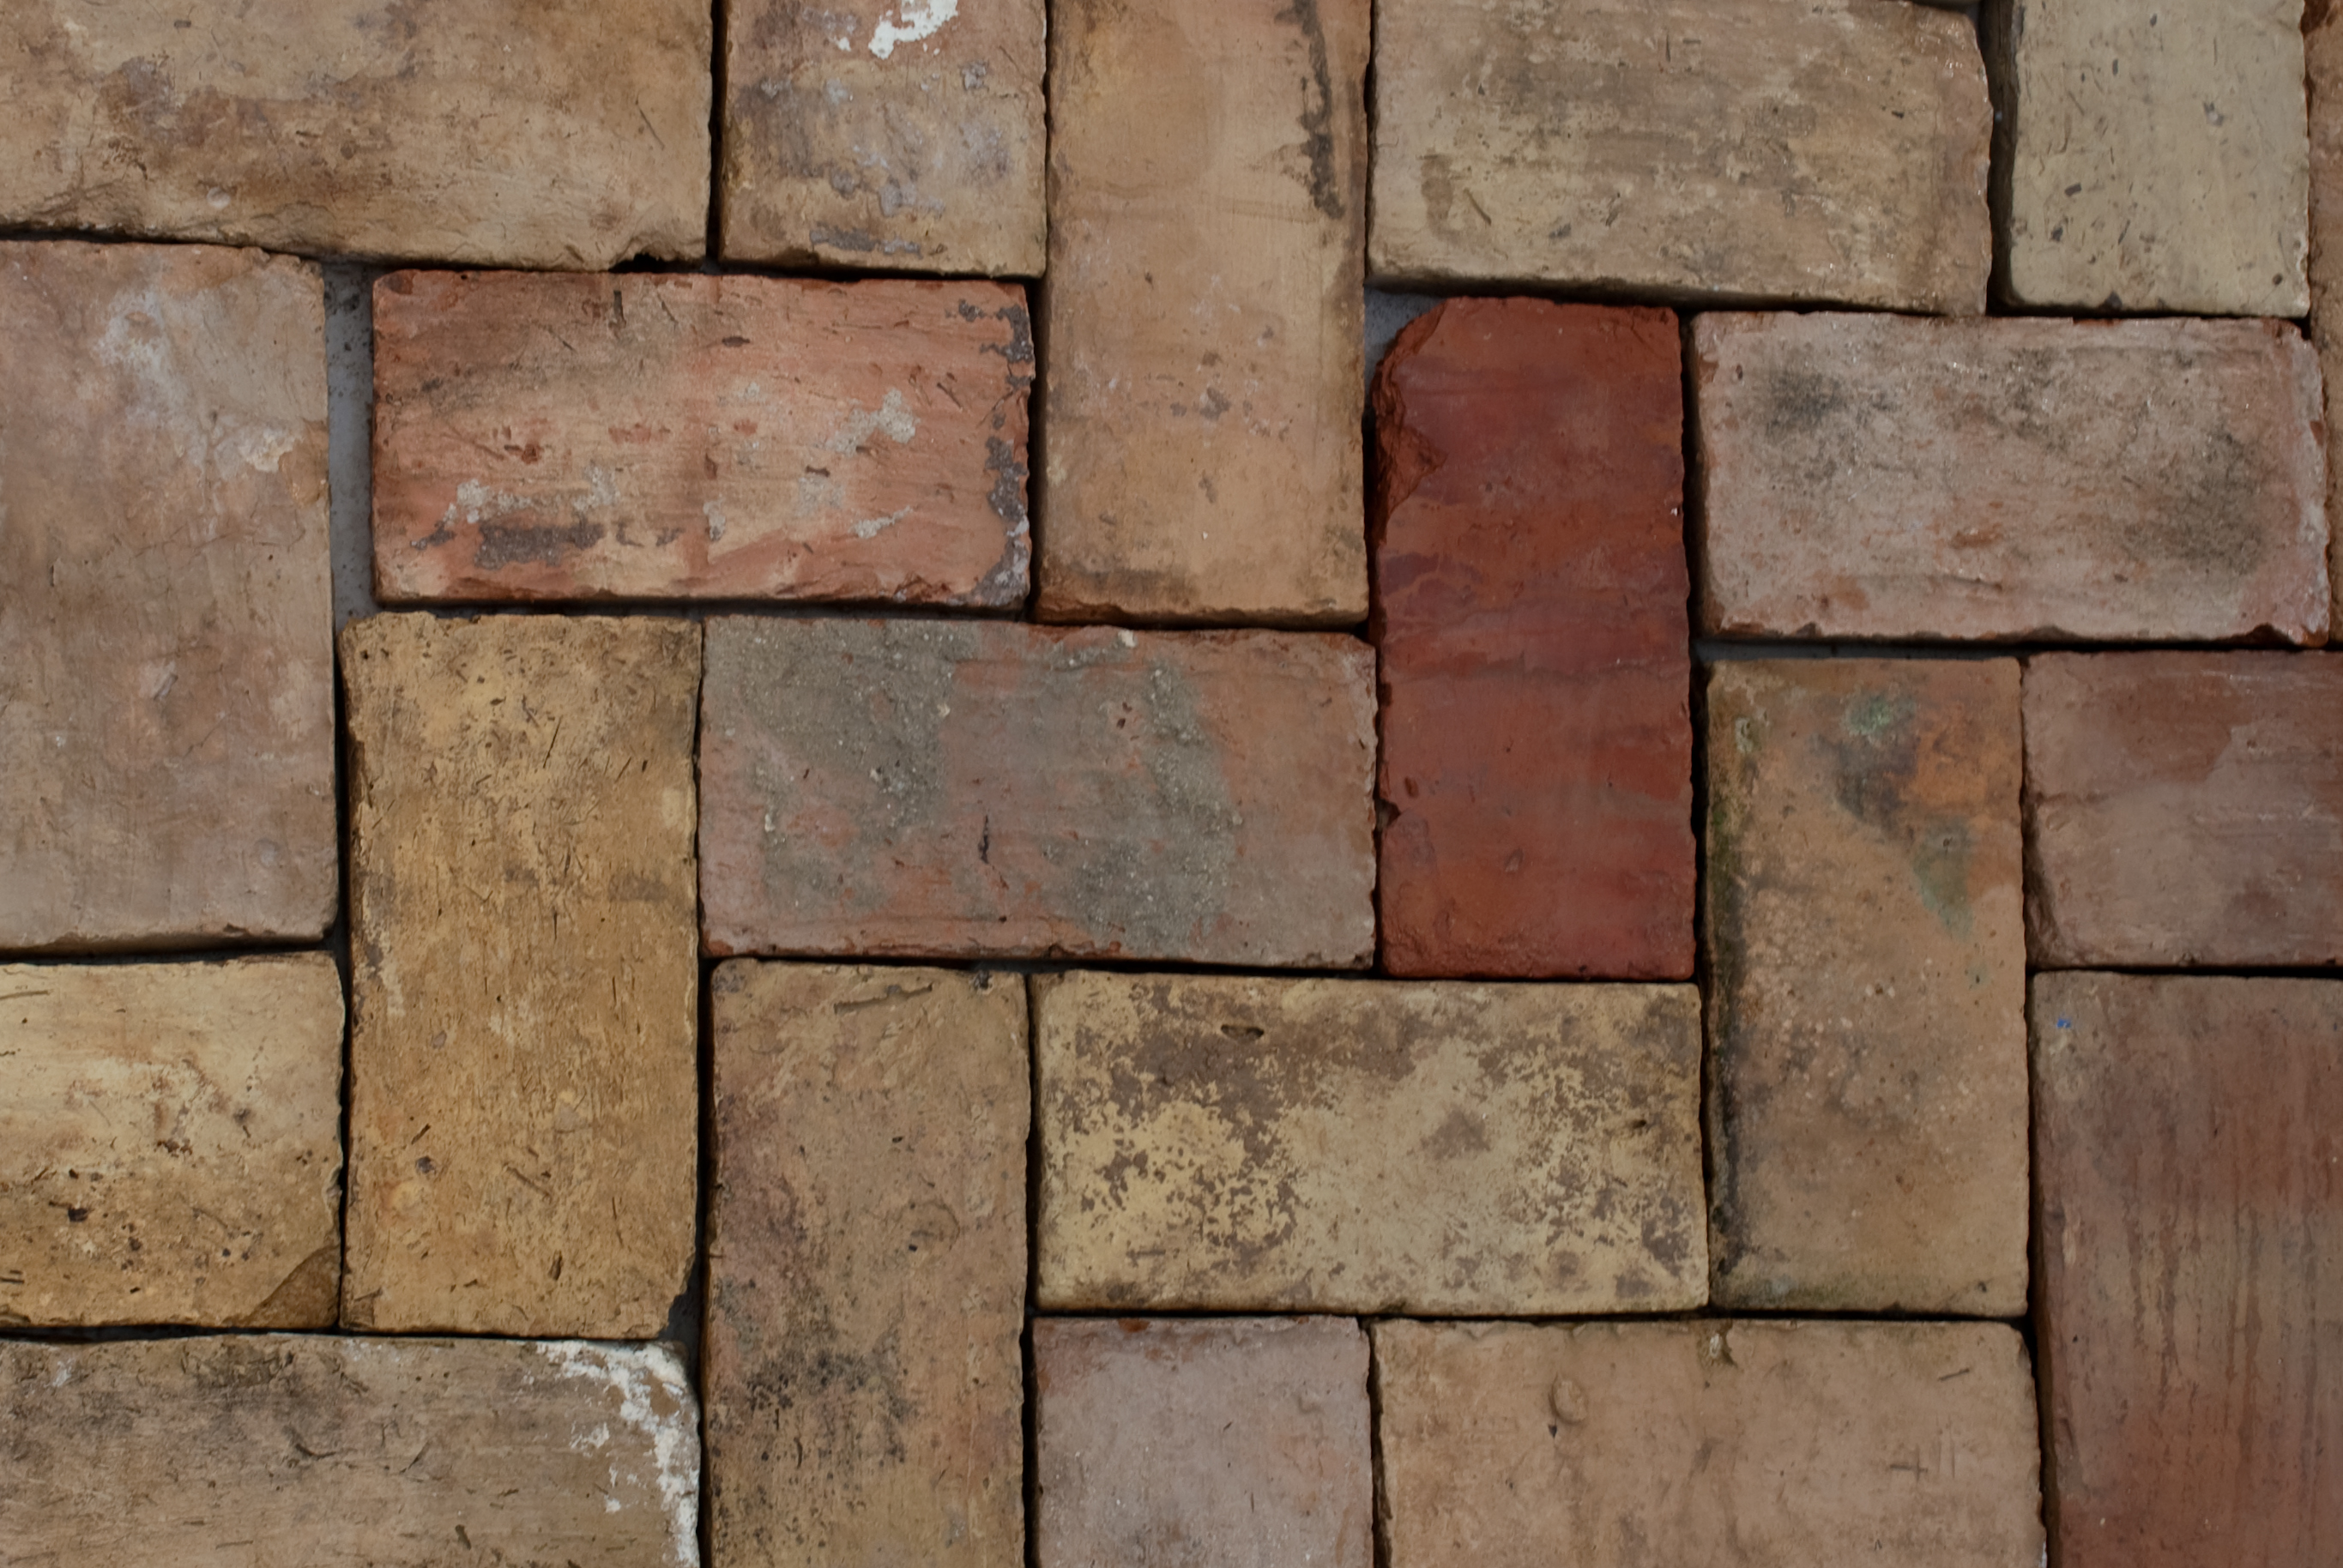 Soler a de ladrillo macizo tosco s xviii xix espacios for Ladrillos decorativos para exteriores